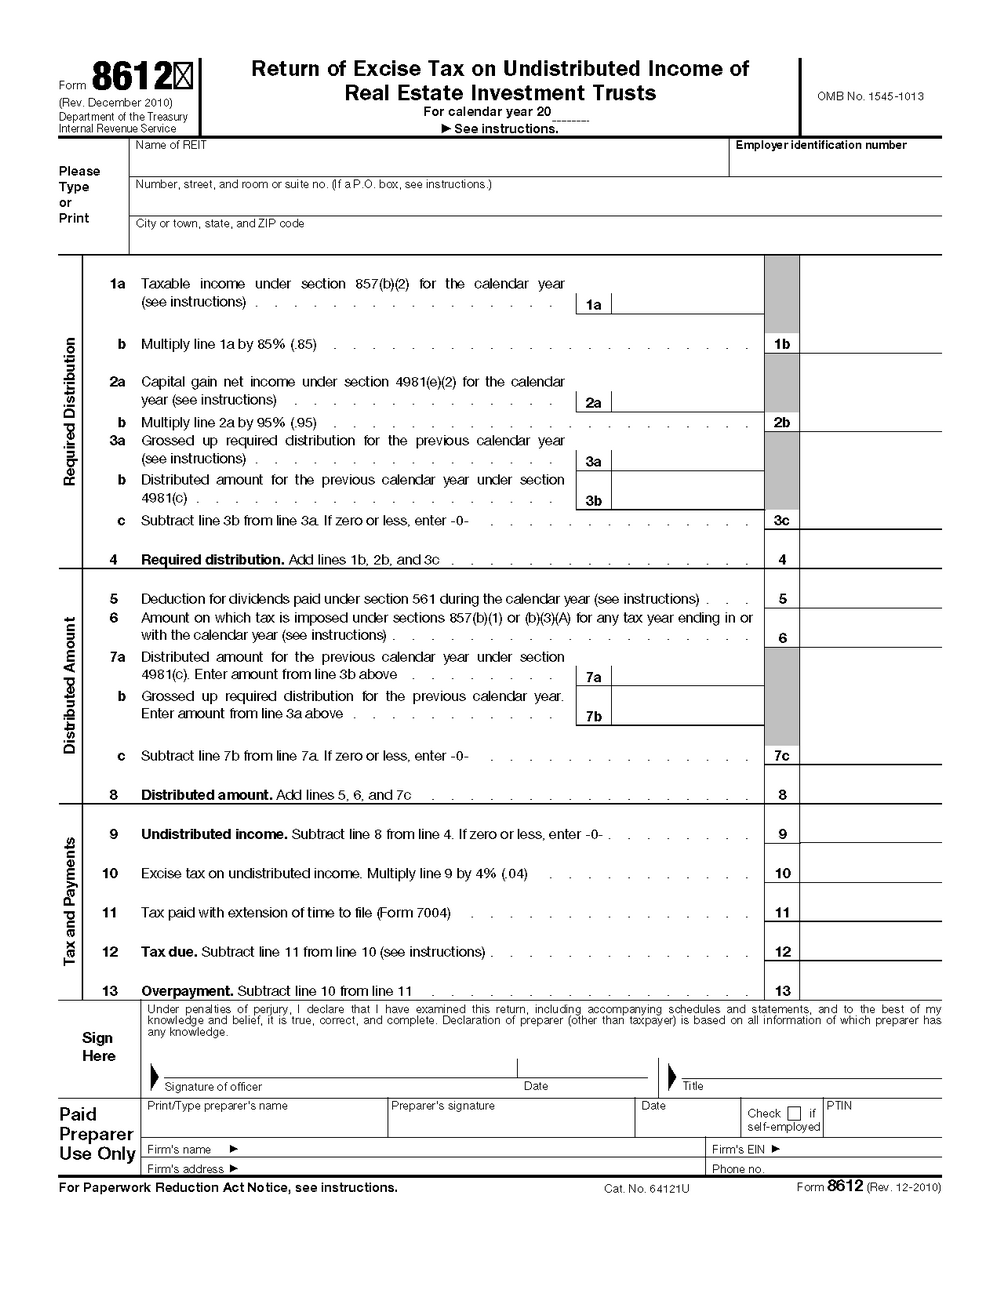 Turbotax E File Form 7004